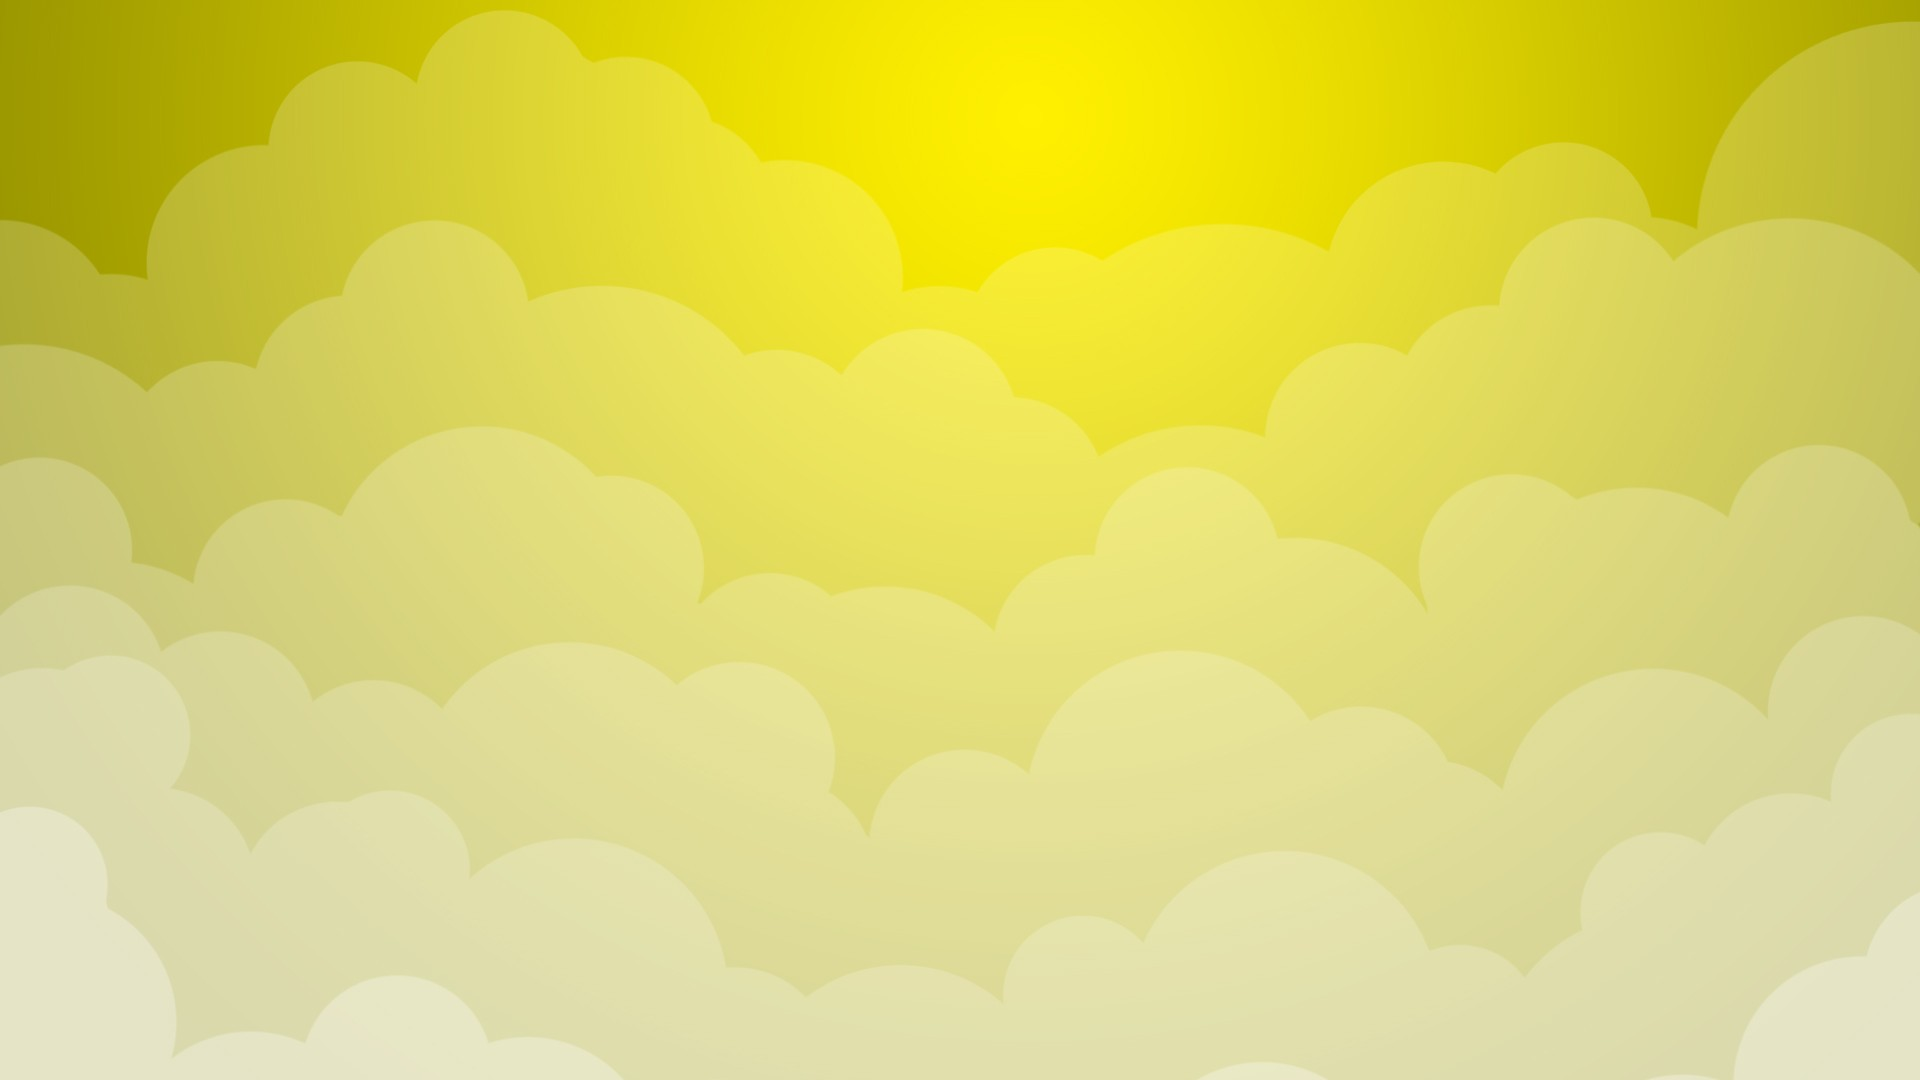 Yellow Wallpaper 1920x1200 1080p